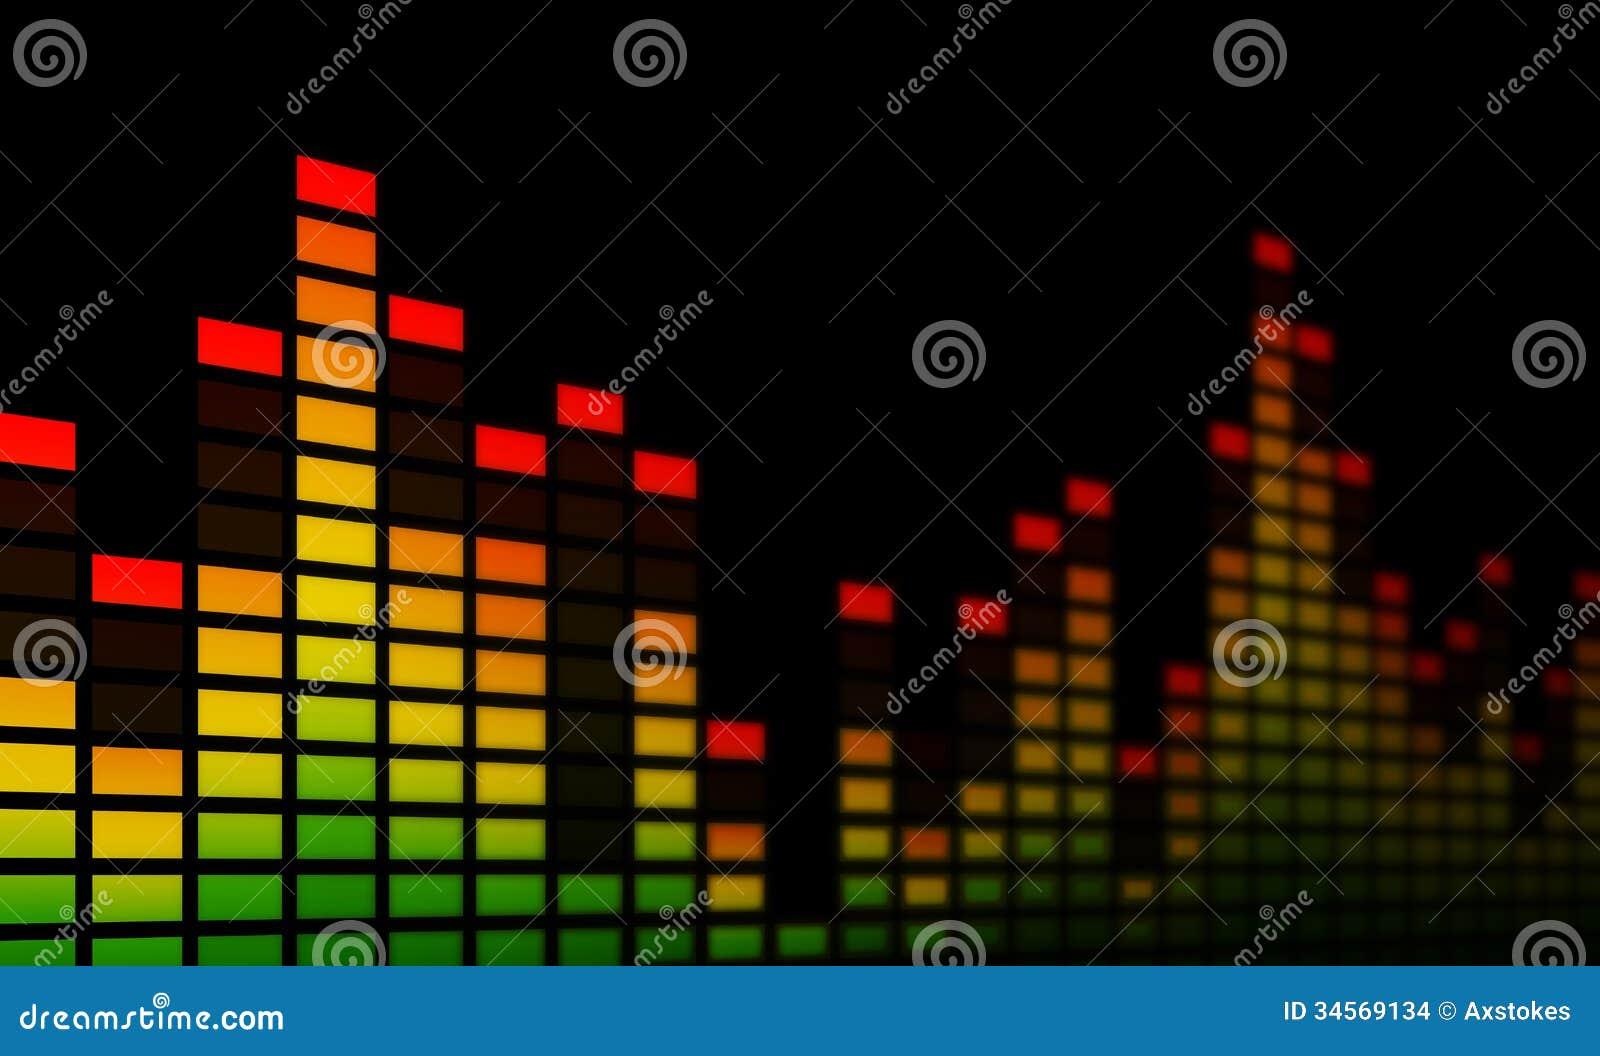 Music Bars Wallpaper: Close-up Stock Illustration